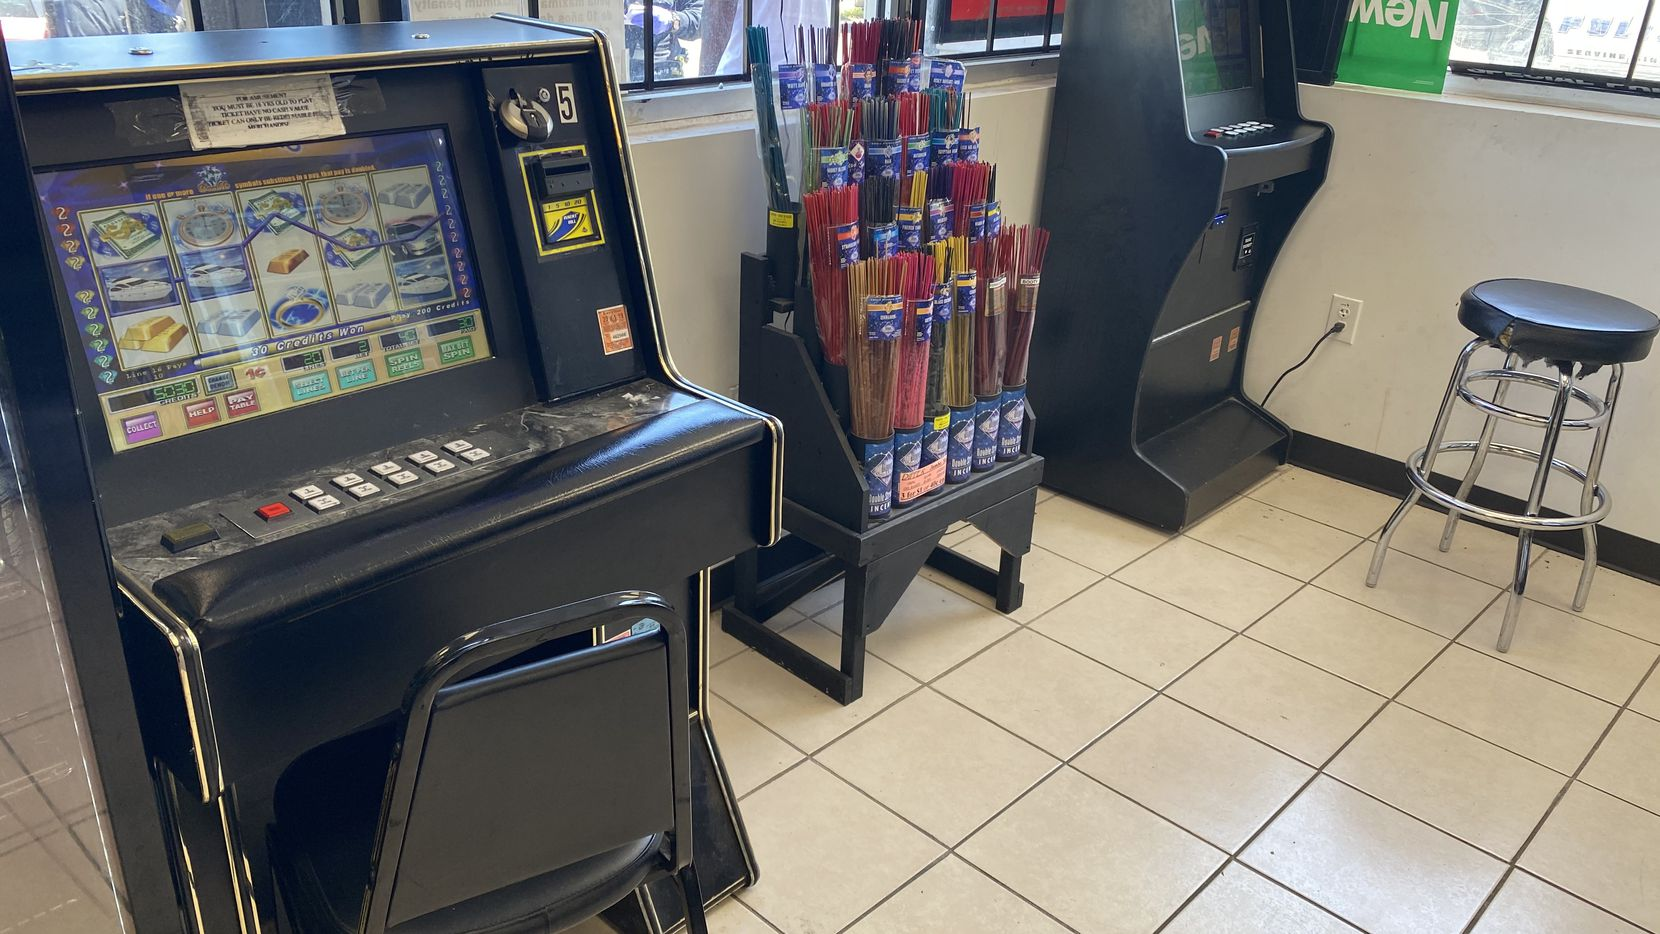 Máquinas confiscadas de juego por DPD